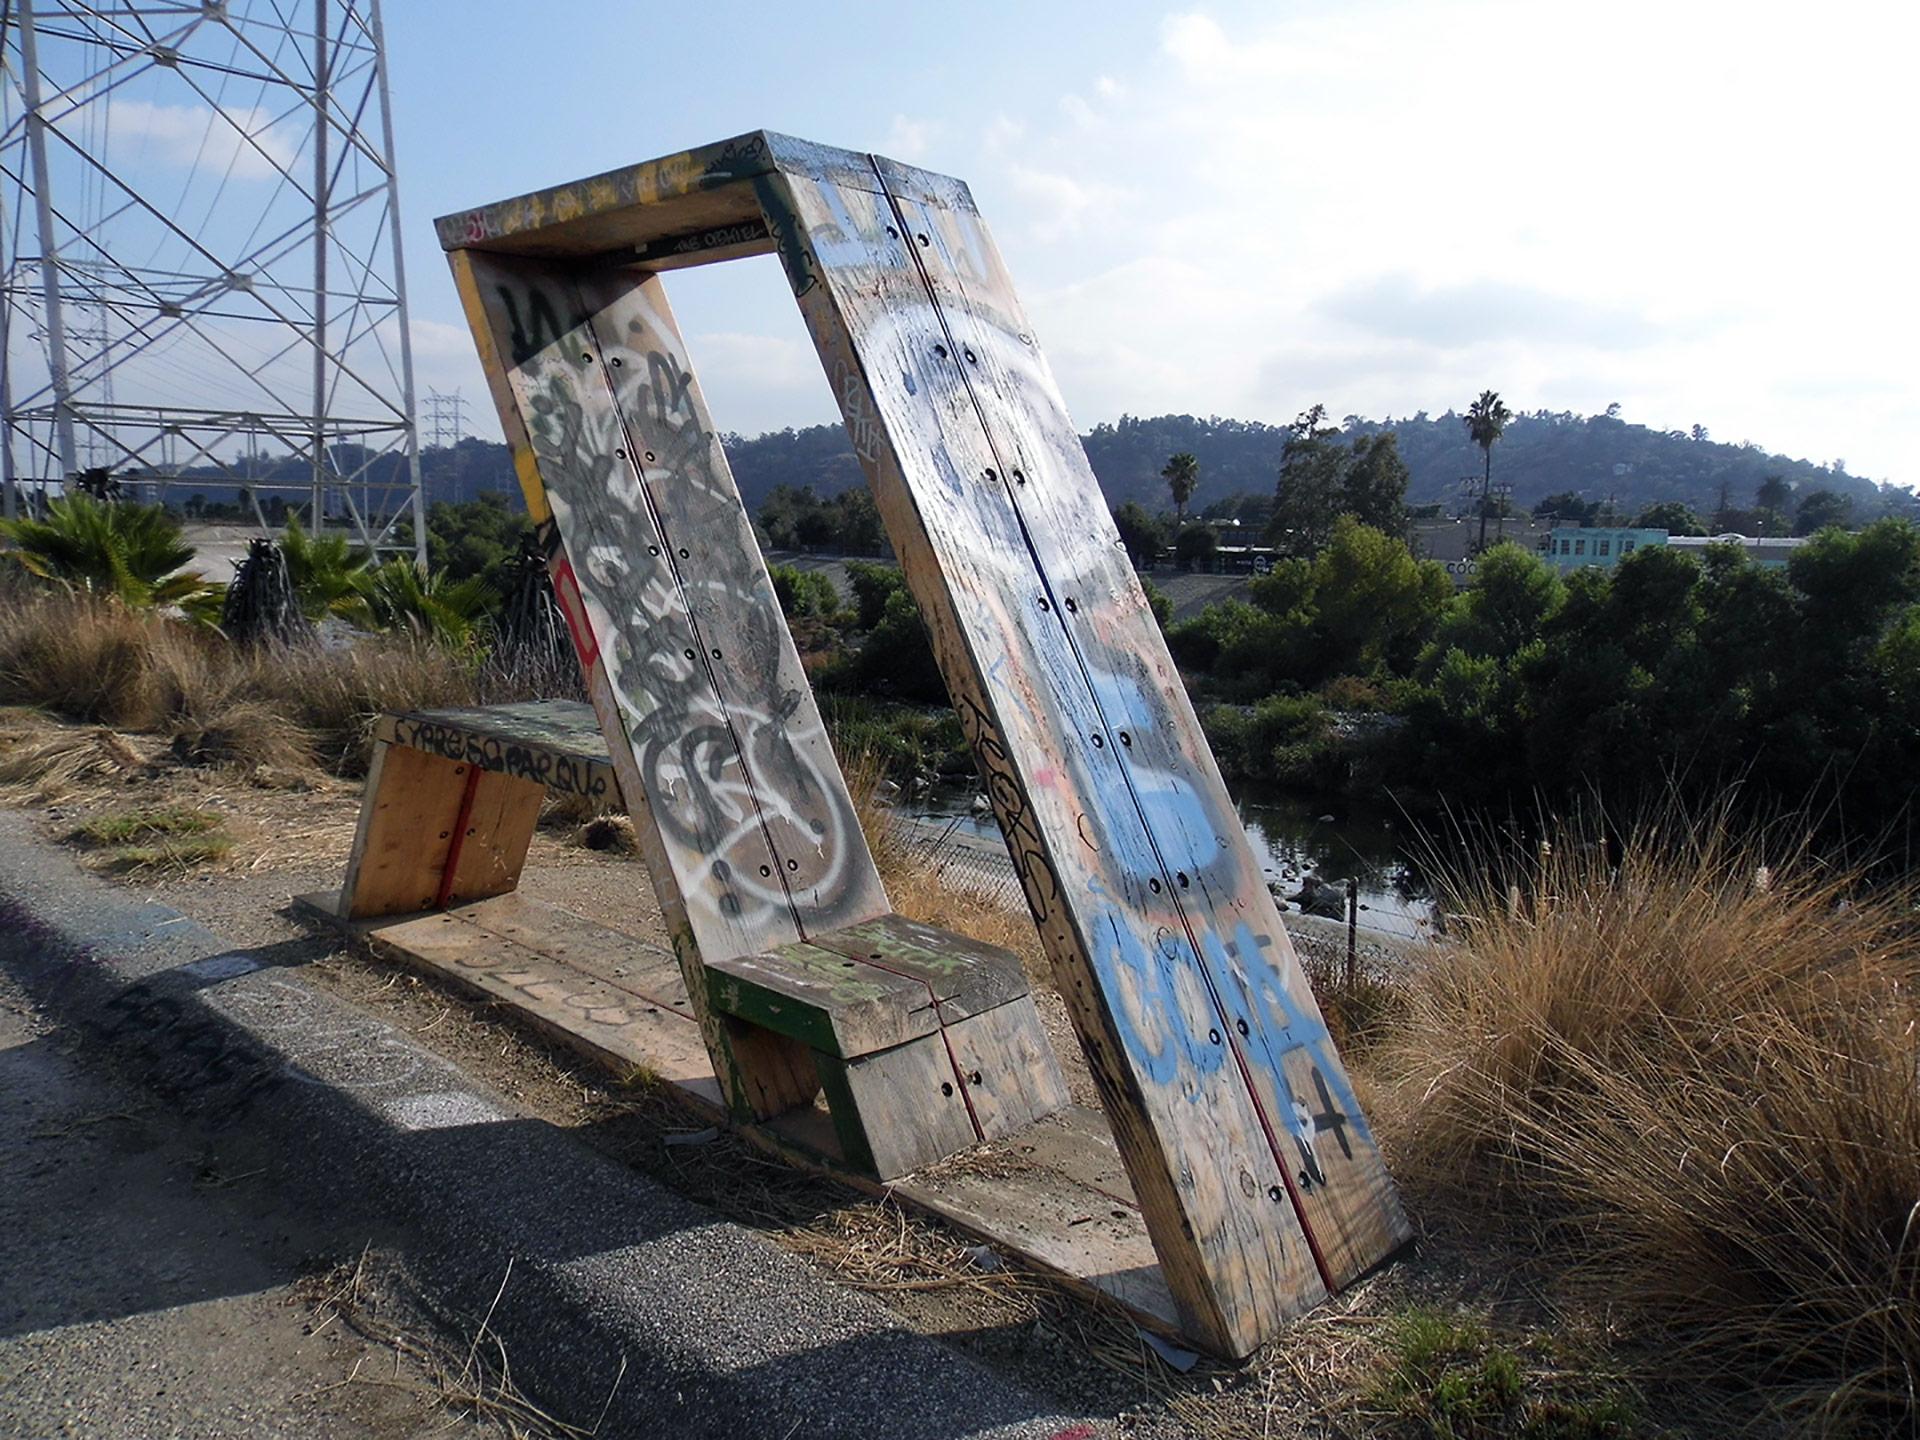 Graffitied artwork at the Bowtie Project. | Sandi Hemmerlein